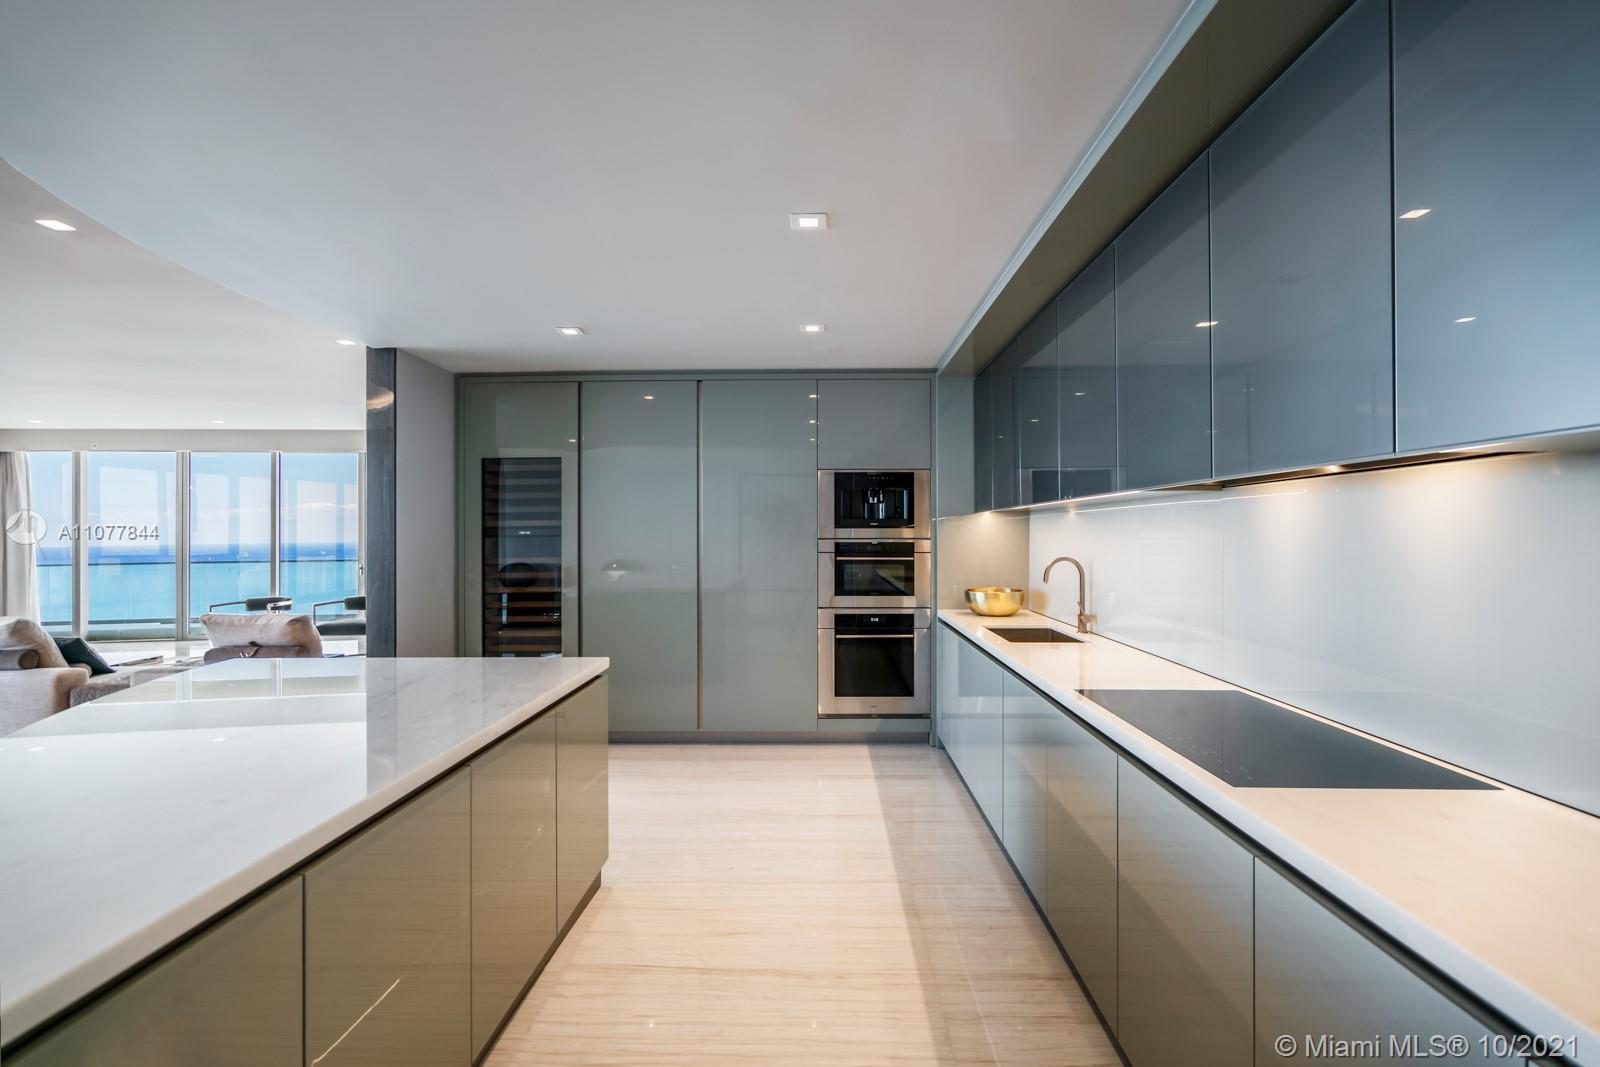 Photo of Residences by Armani Casa Apt 3700